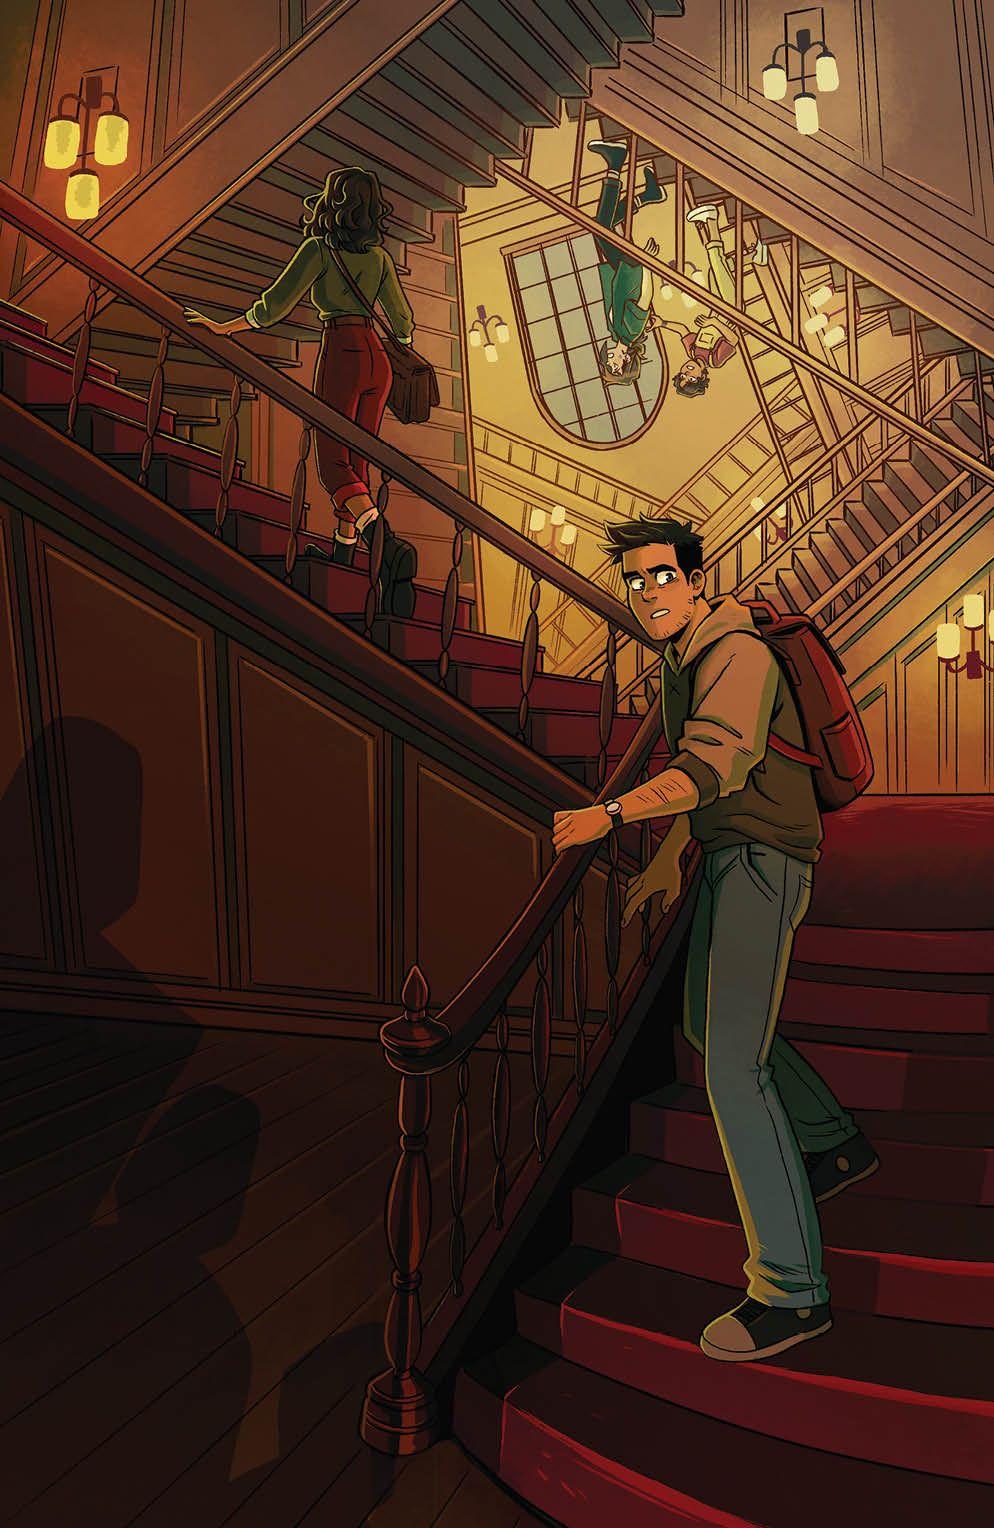 SpecterInspectors_003_Cover_C_Variant ComicList Previews: SPECTER INSPECTORS #3 (OF 5)